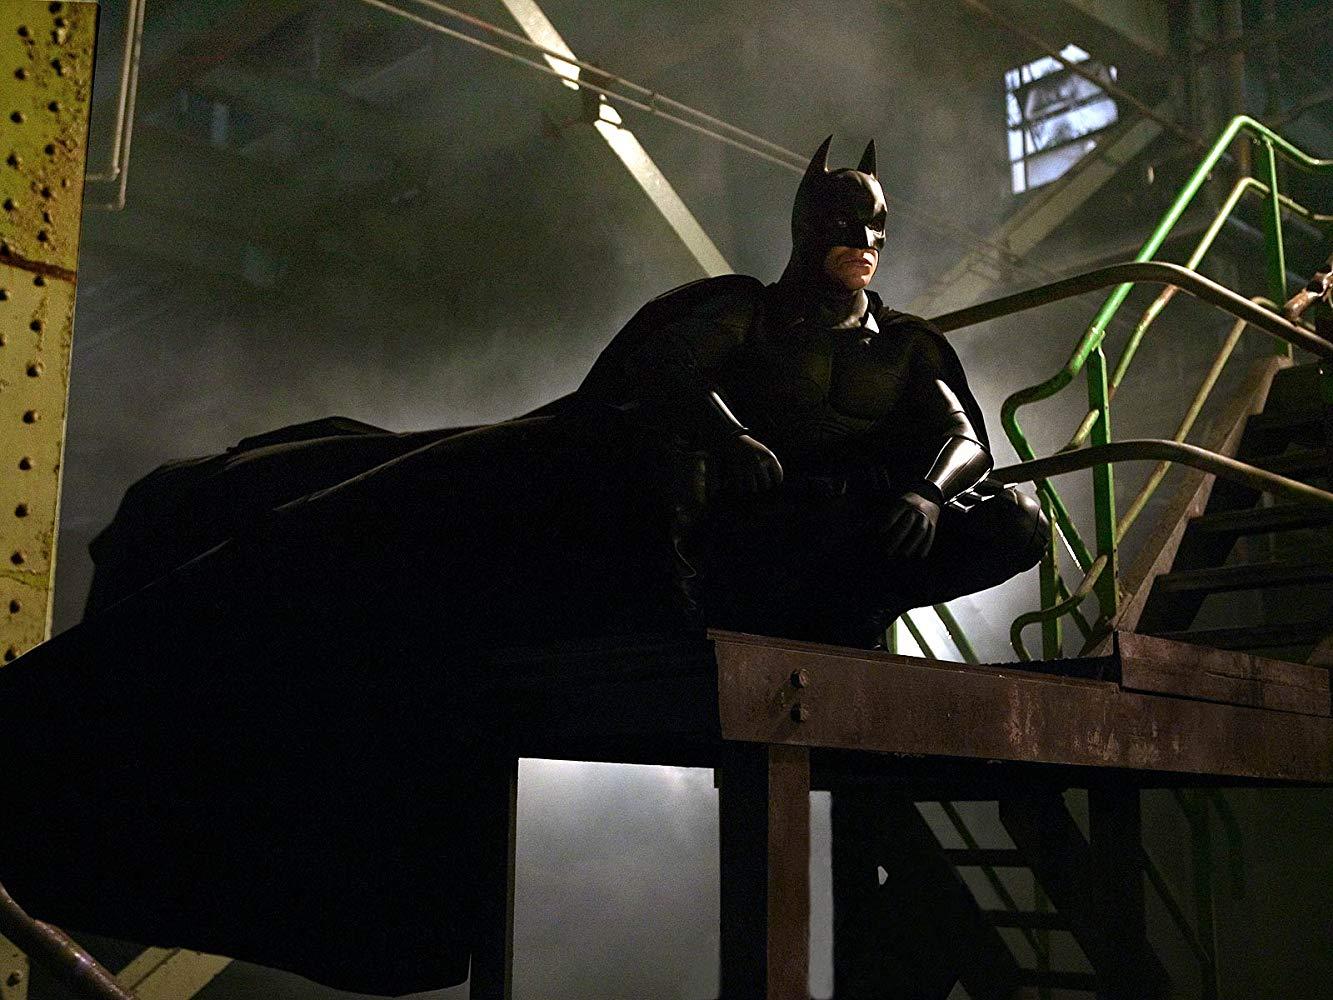 Christian Bale as Batman in Batman Begins (2005)